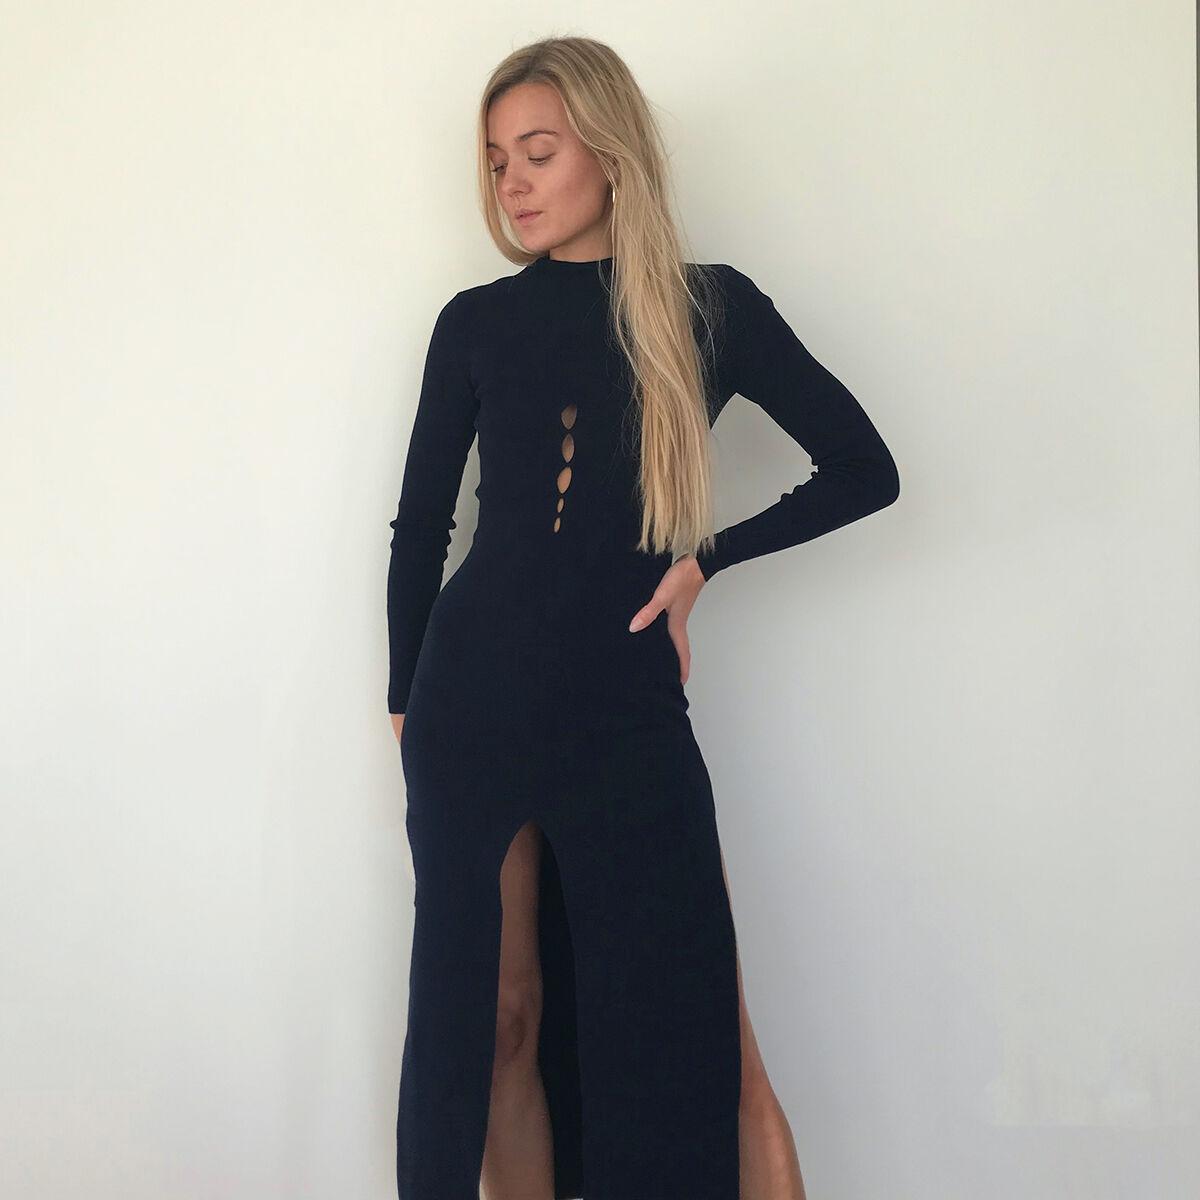 Mikaela_Jacquemus_dress